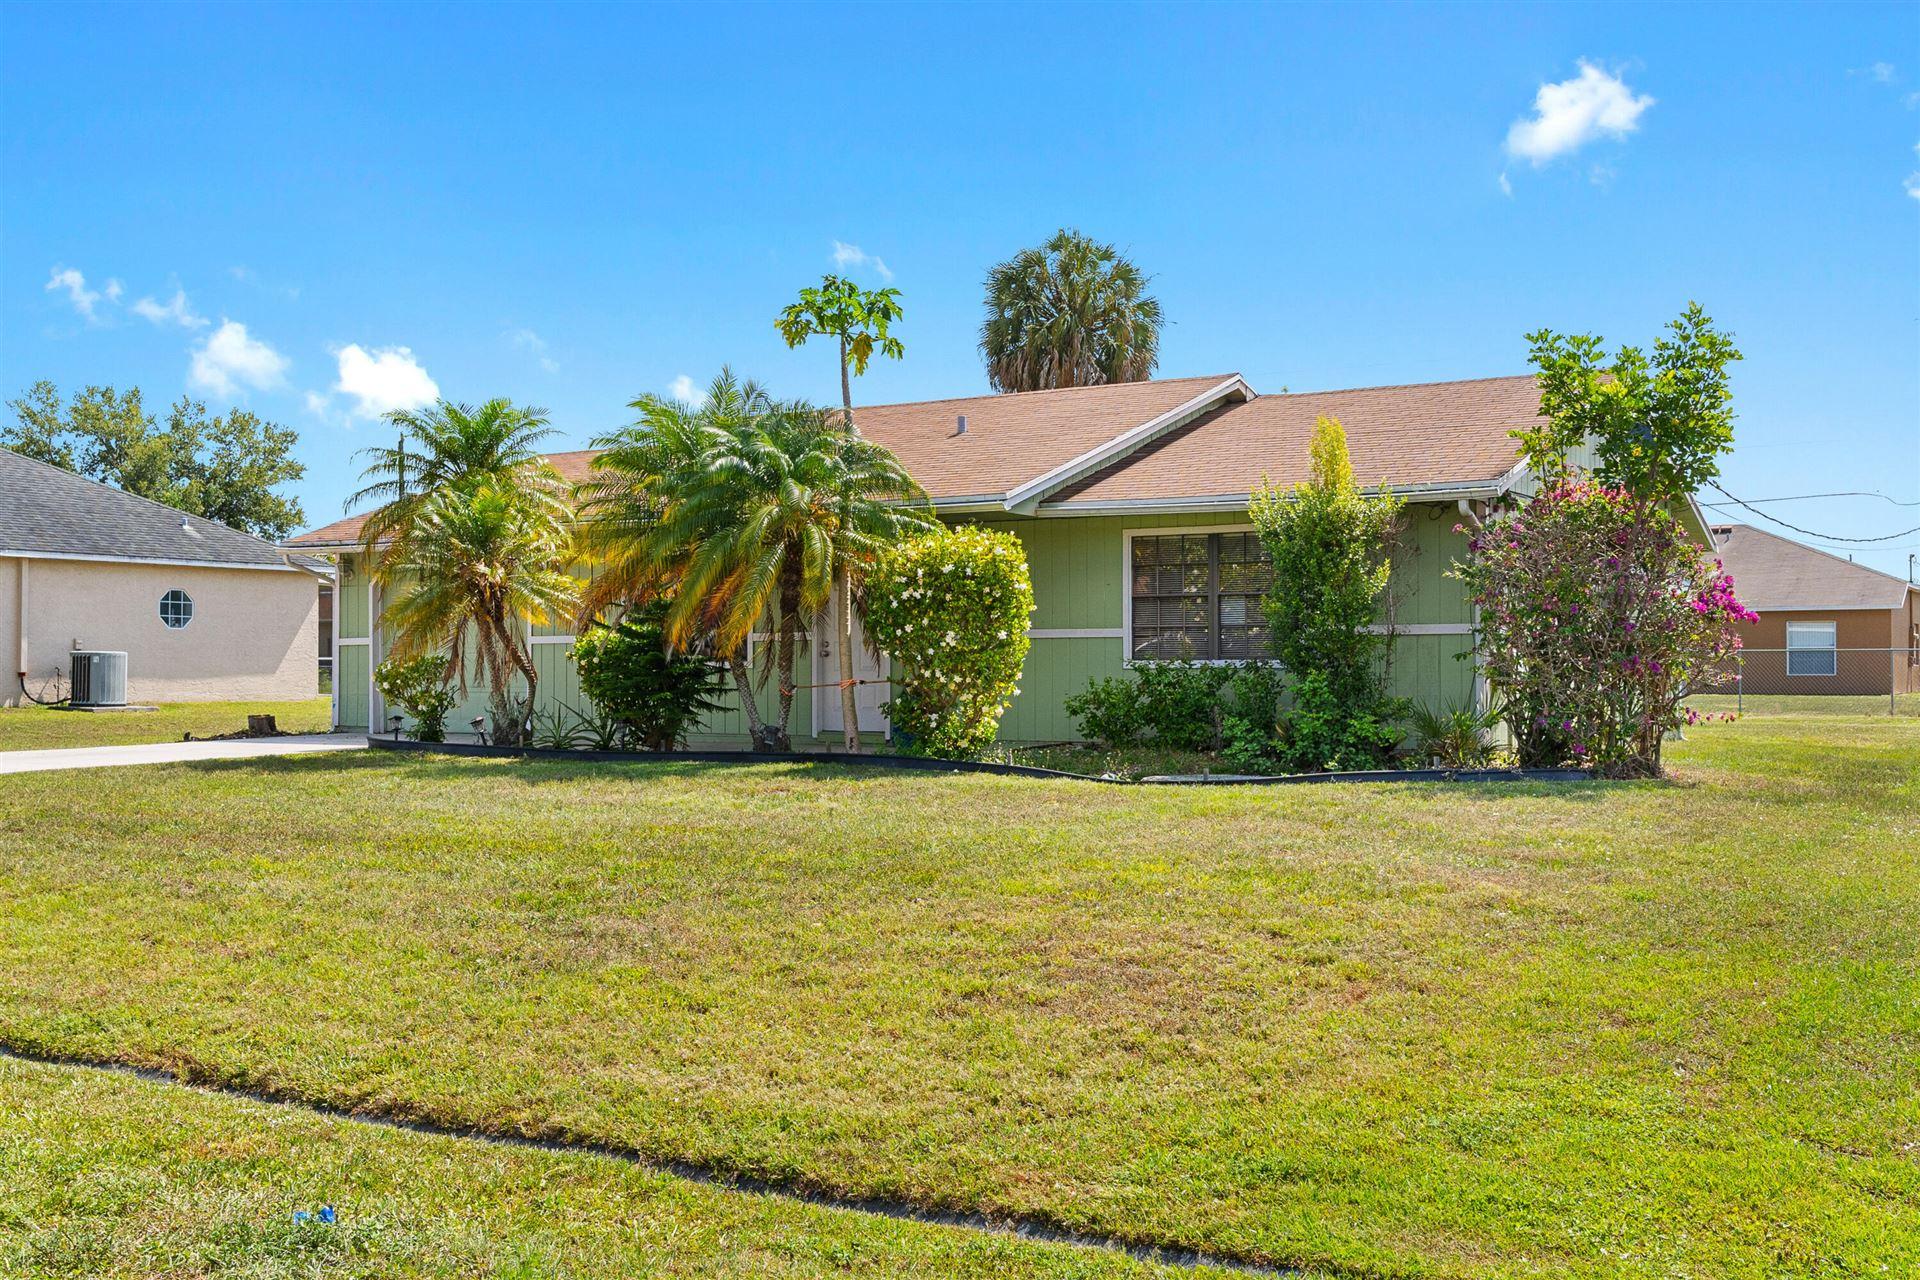 1271 SW Heather Street, Port Saint Lucie, FL 34983 - MLS#: RX-10713025